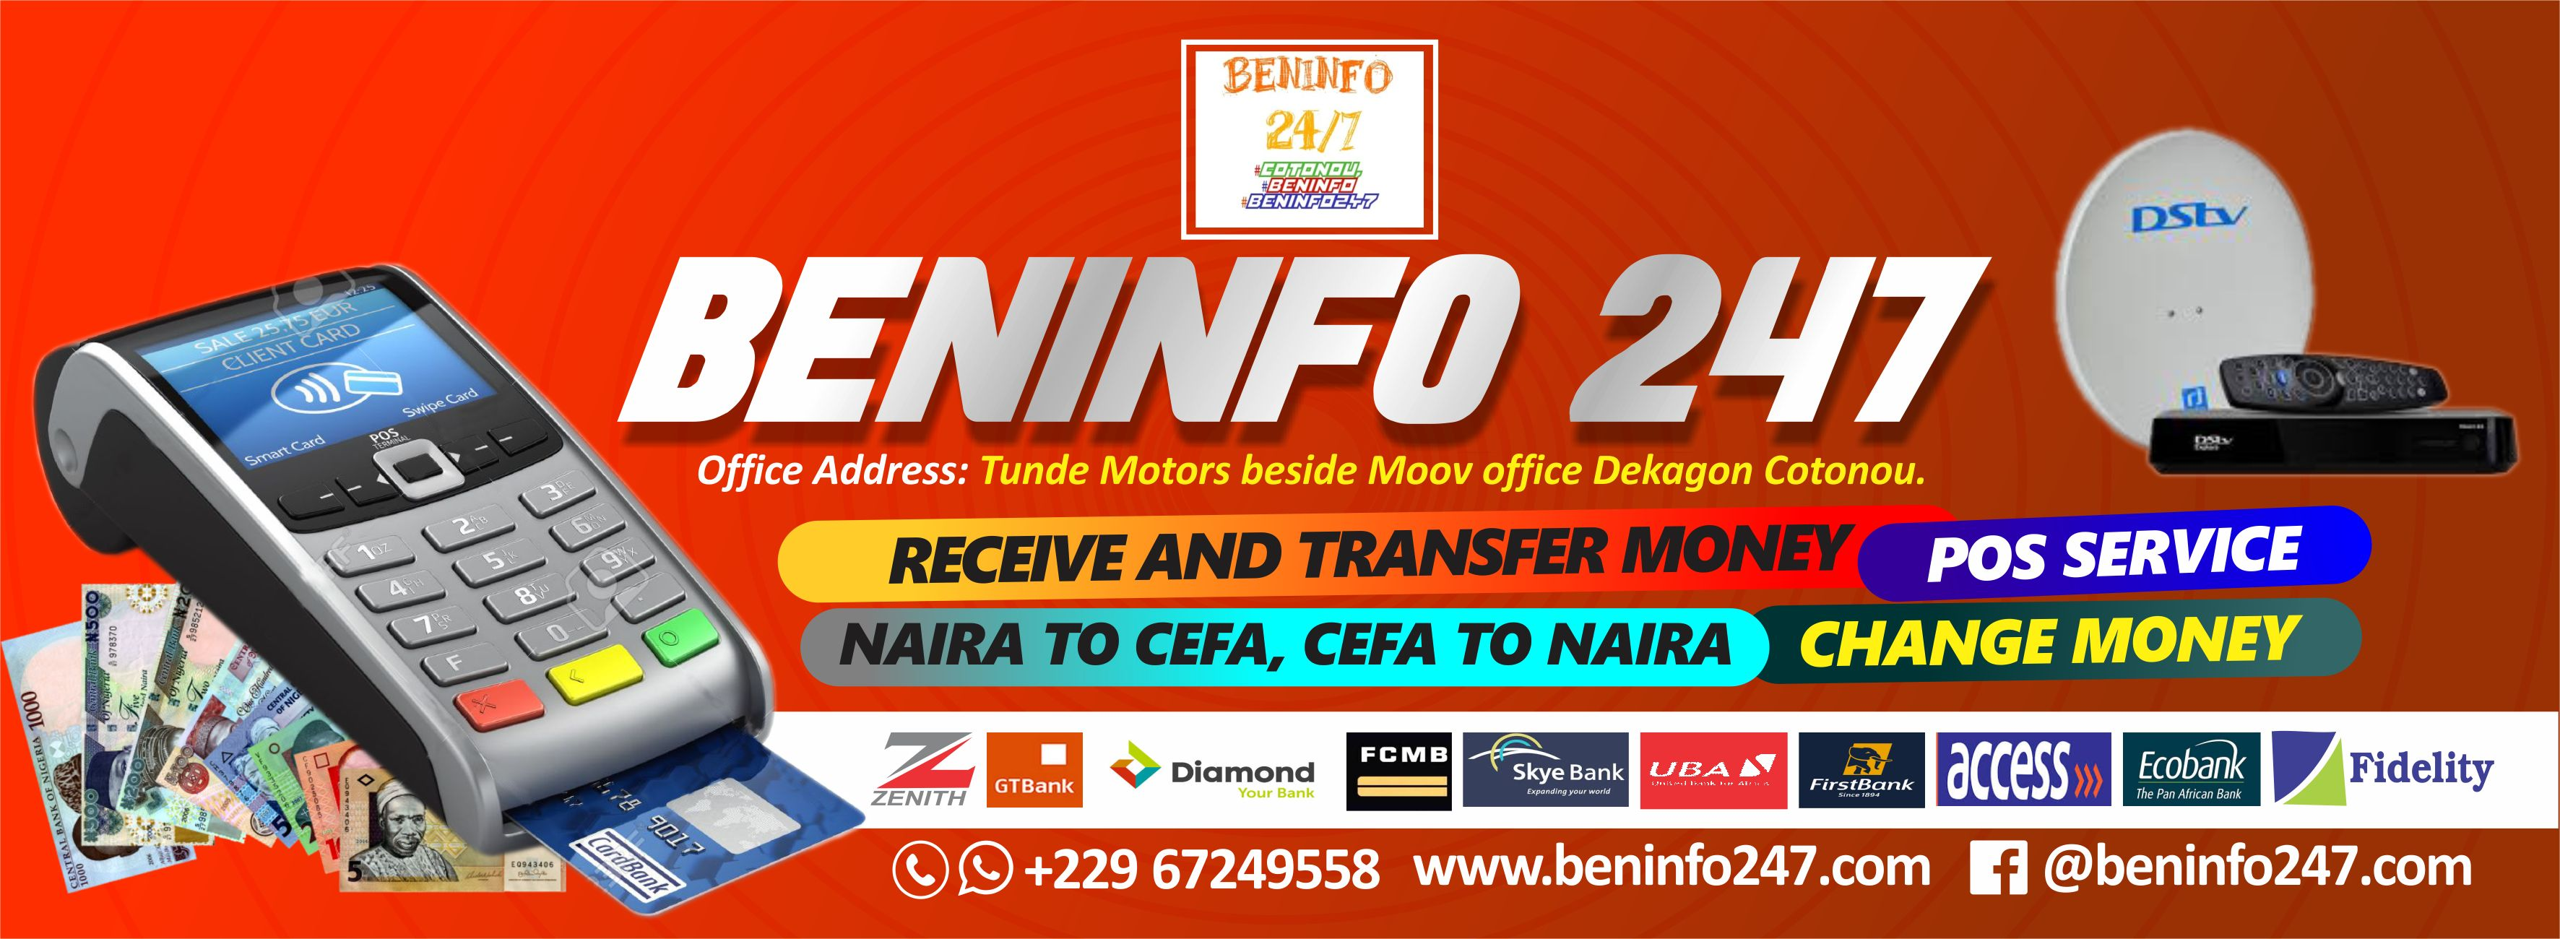 Benifo247 services